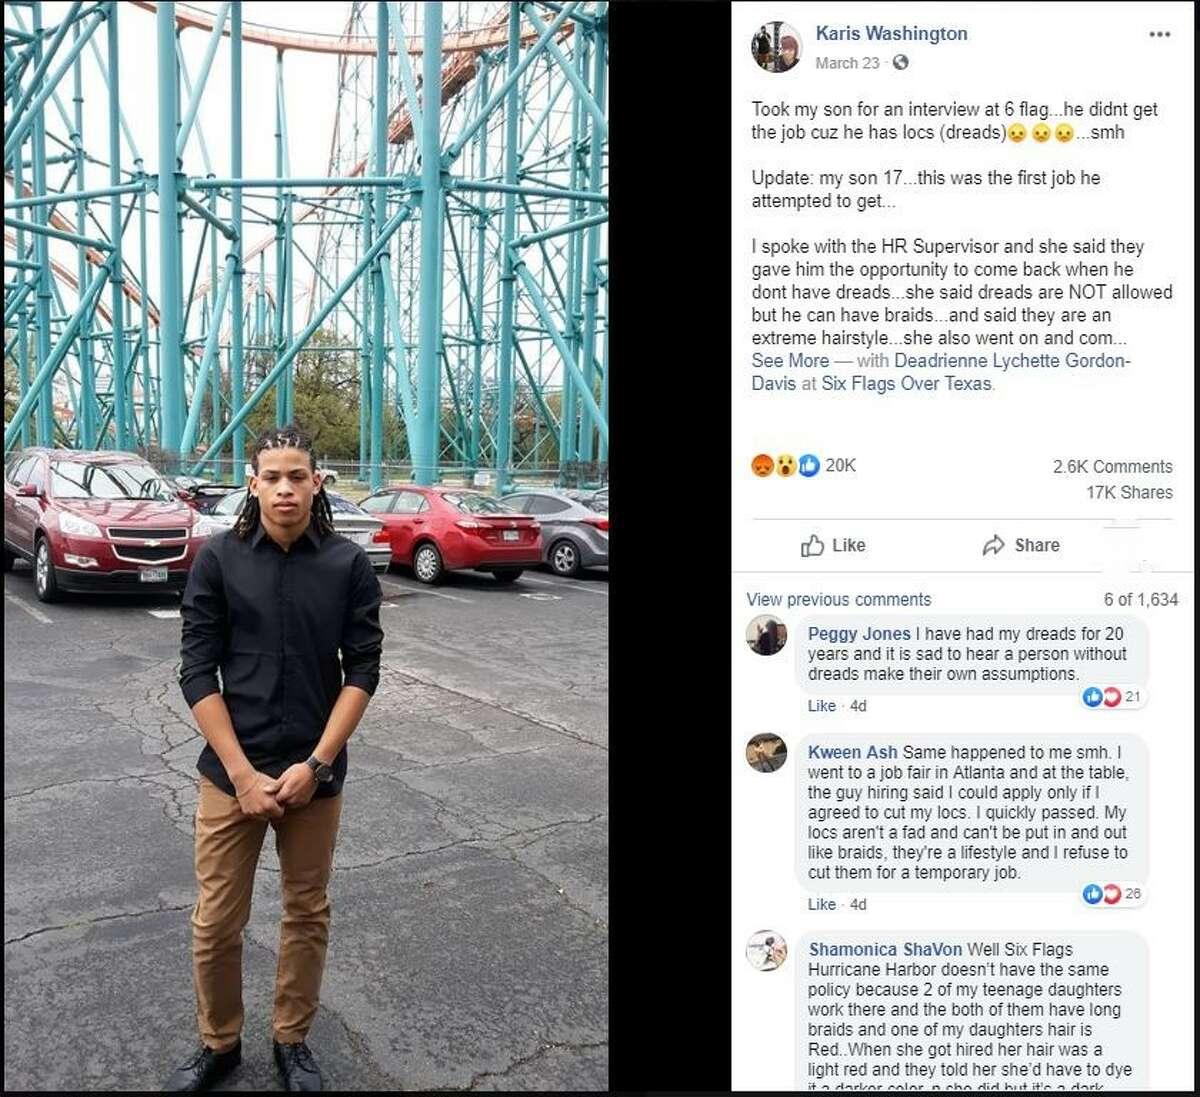 Karis Washington took to social media to vent her frustration.